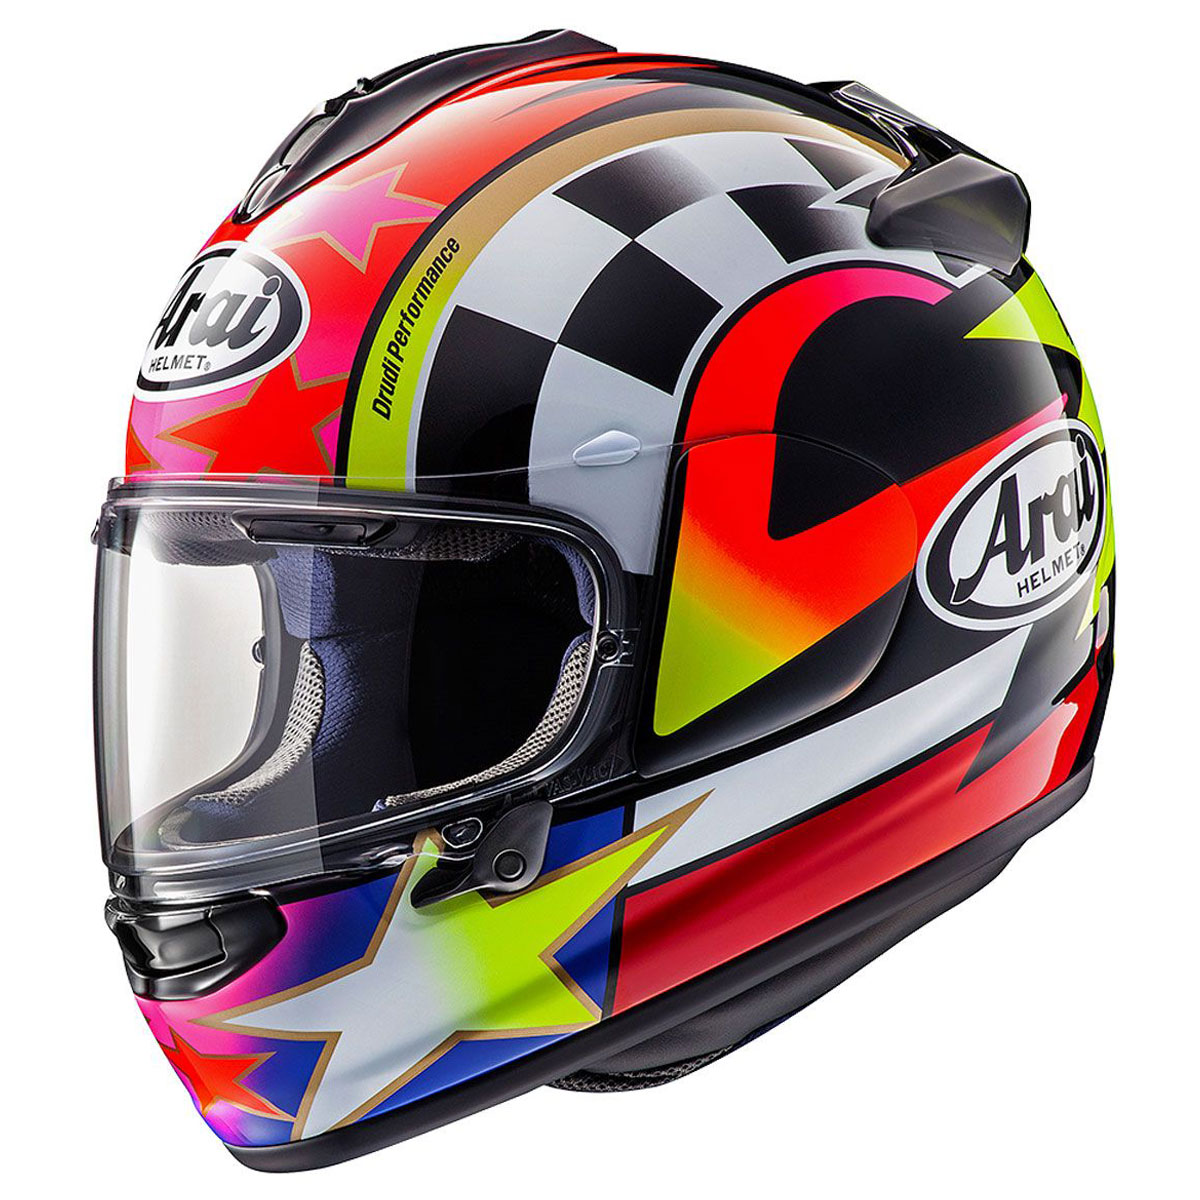 Arai Chaser X Schwantz 95 Motorbike Motorcycle Helmet Ebay